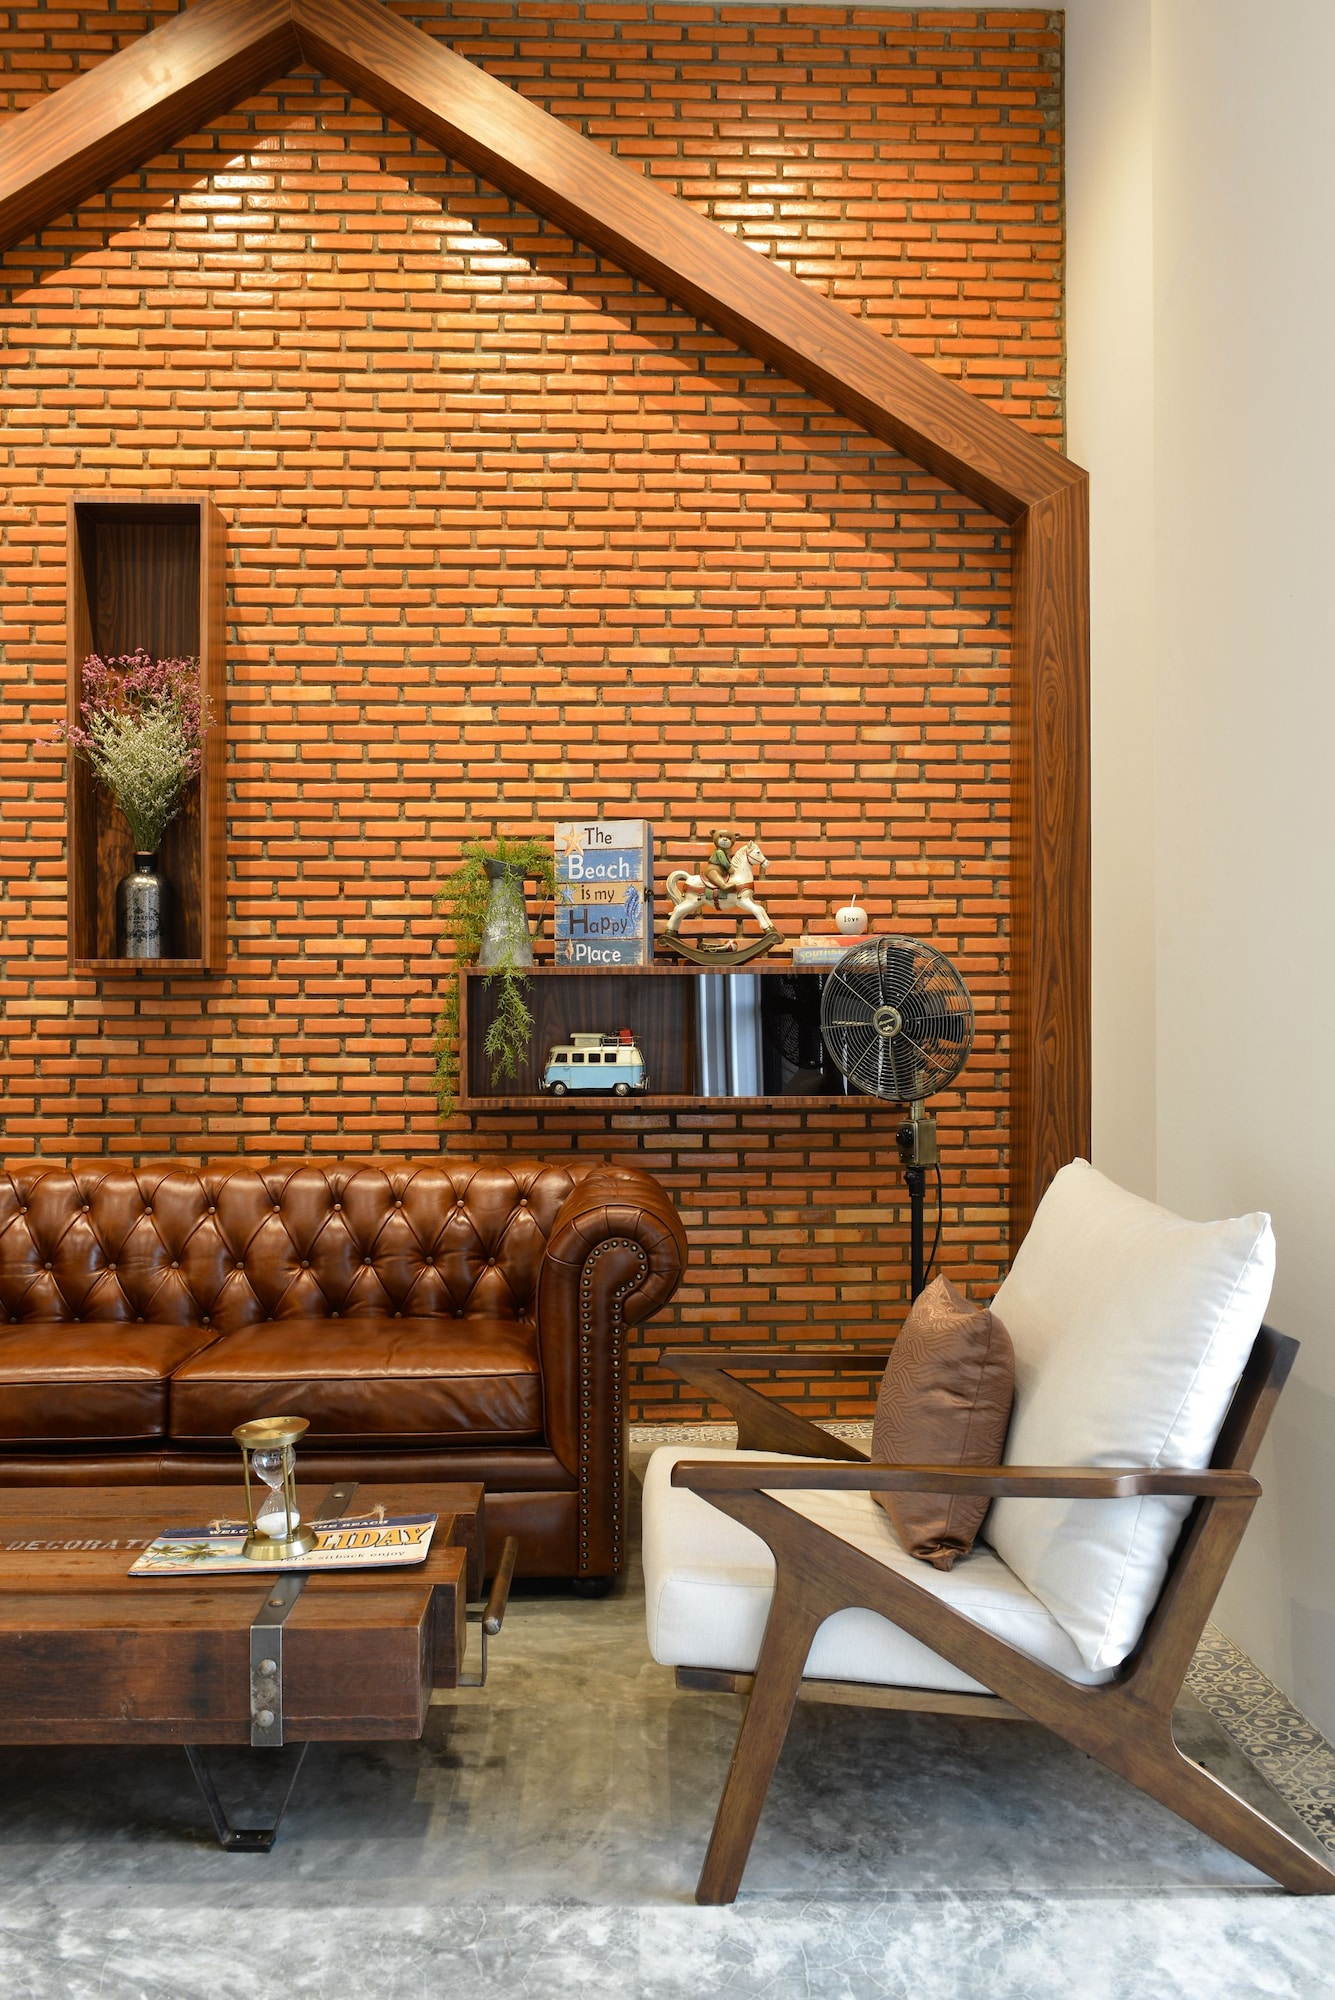 The Chill at Krabi Hotel, Muang Krabi